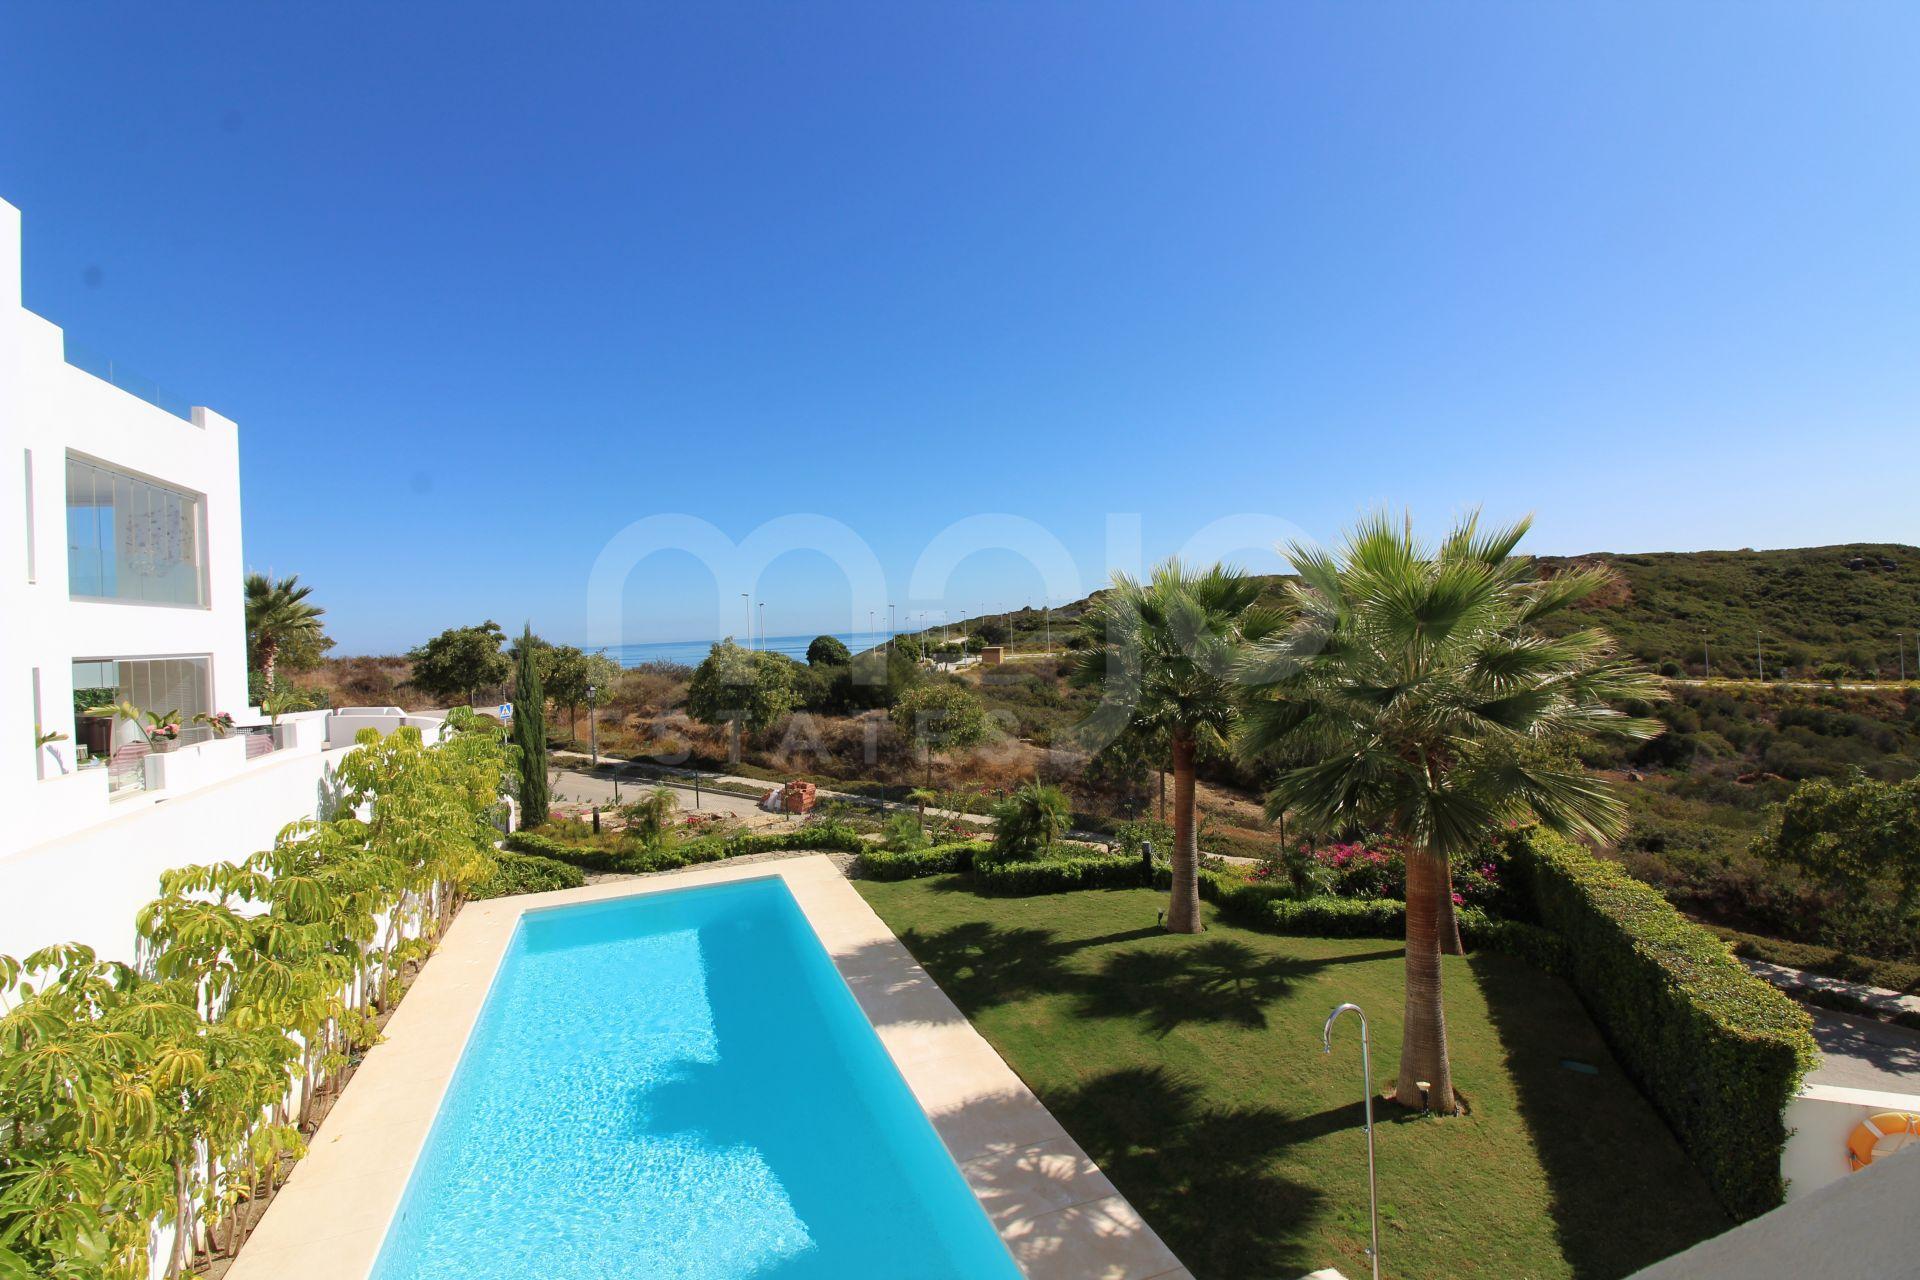 Luxurious apartment in 5 star golf resort